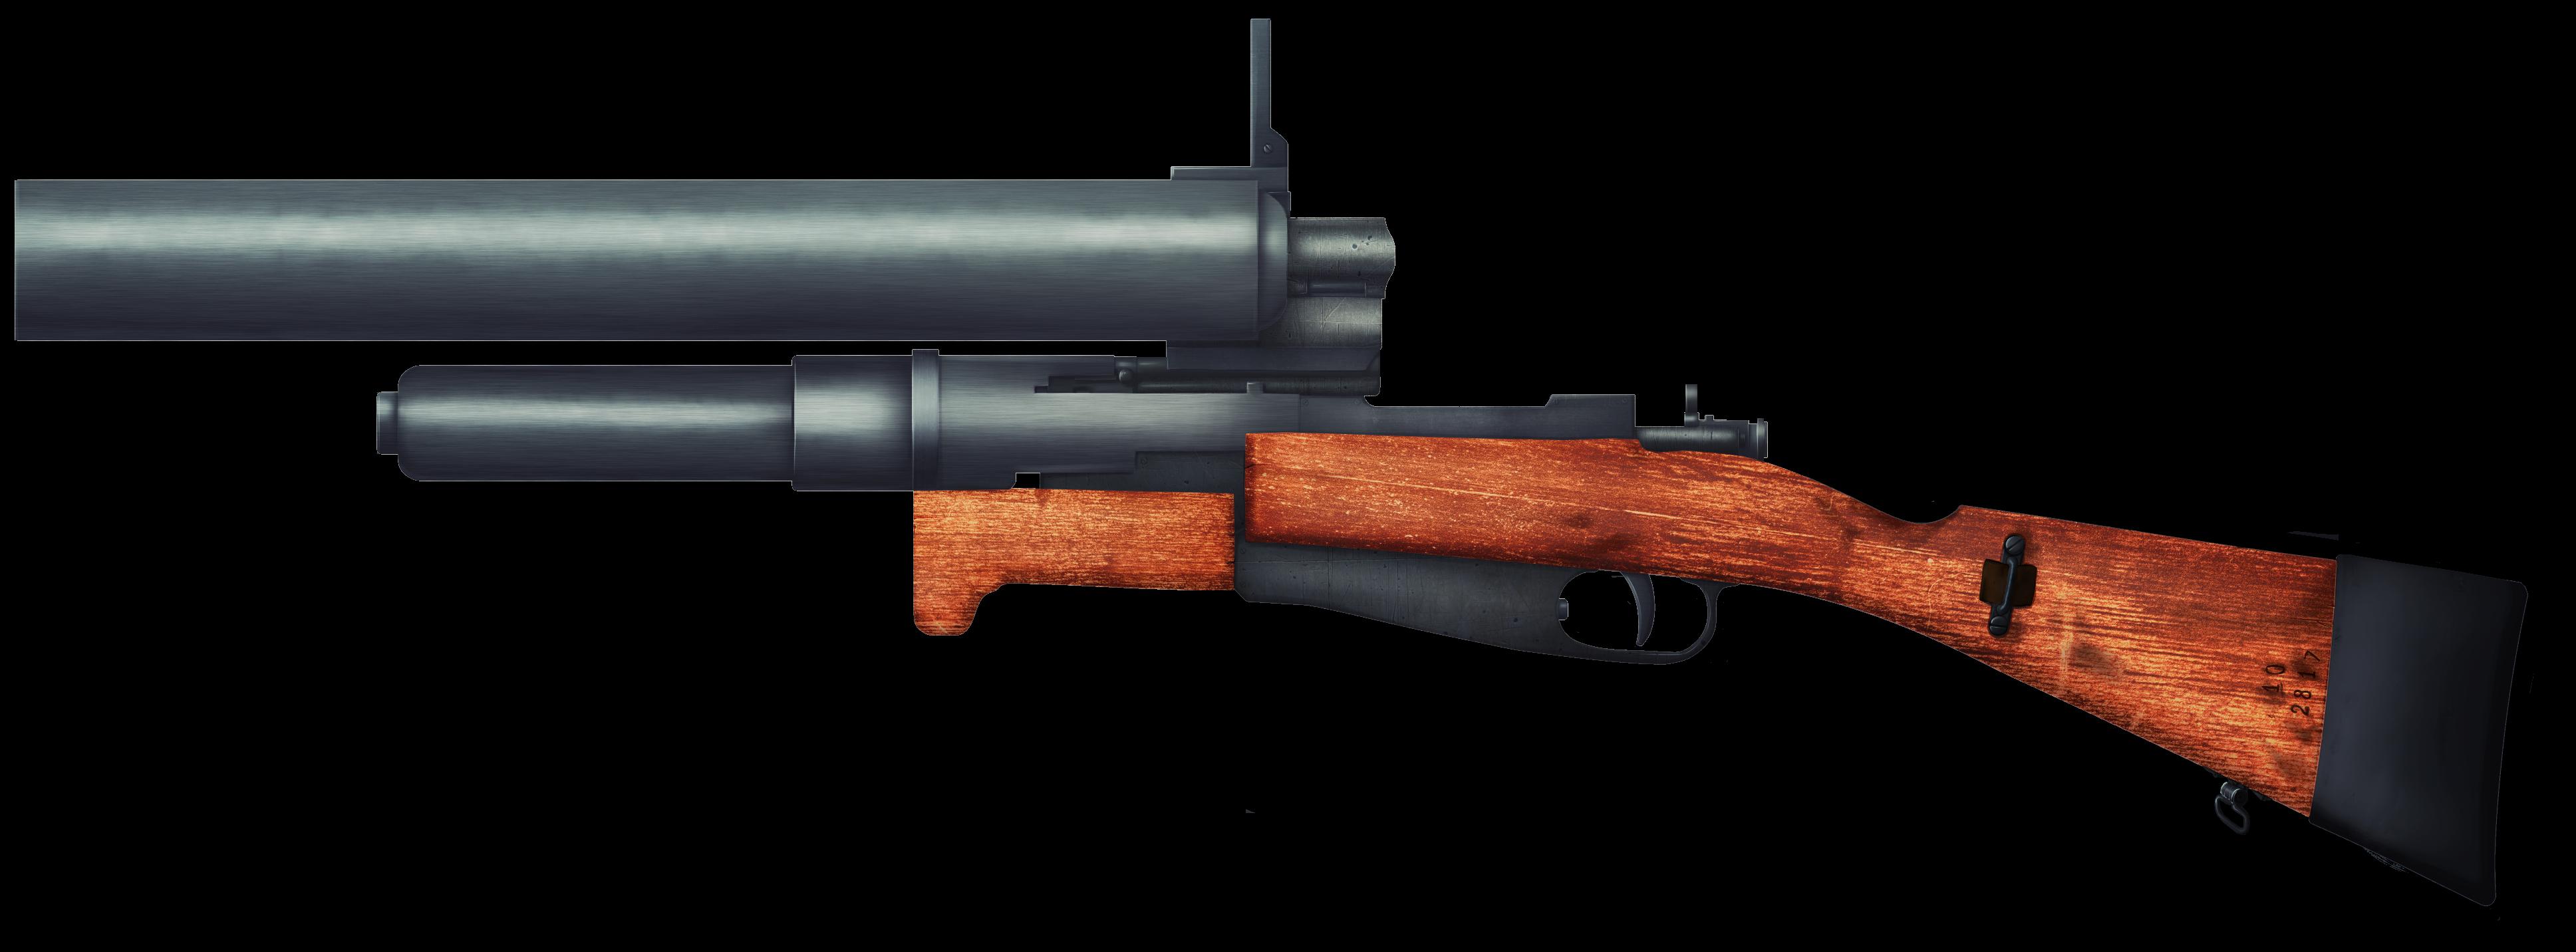 60mm Lanciabombe